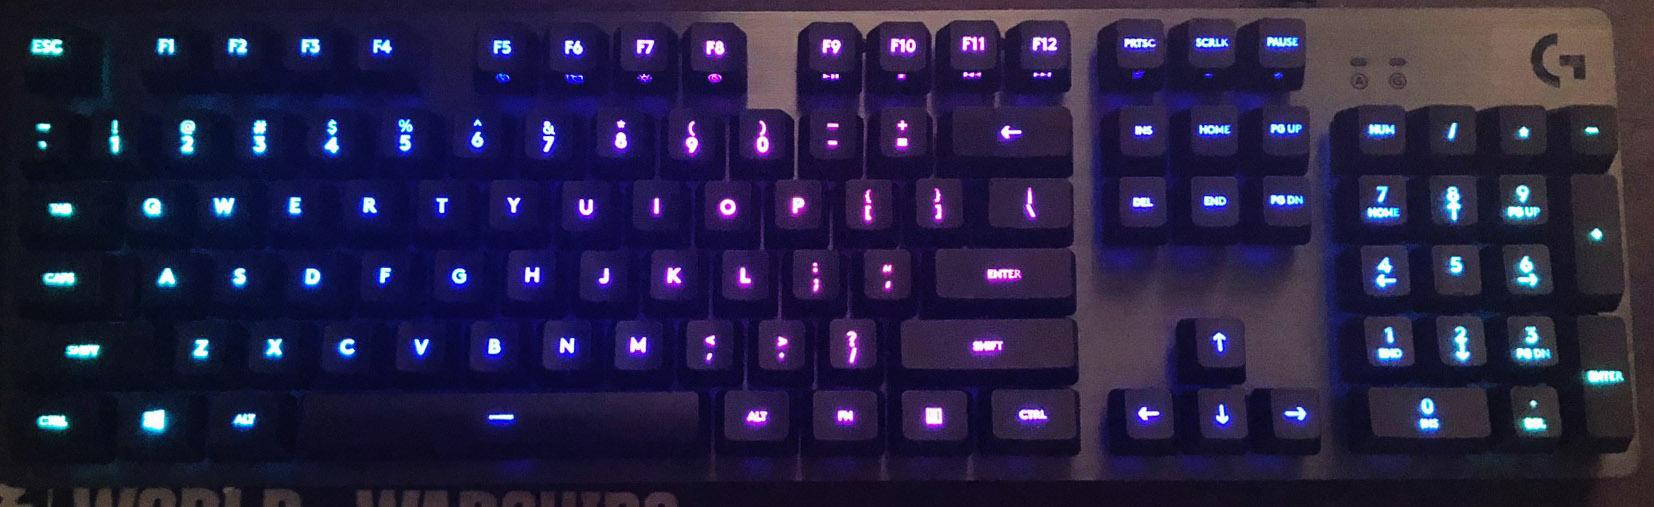 Logitech G512 Carbon Mechanical Keyboard Review - Rocket